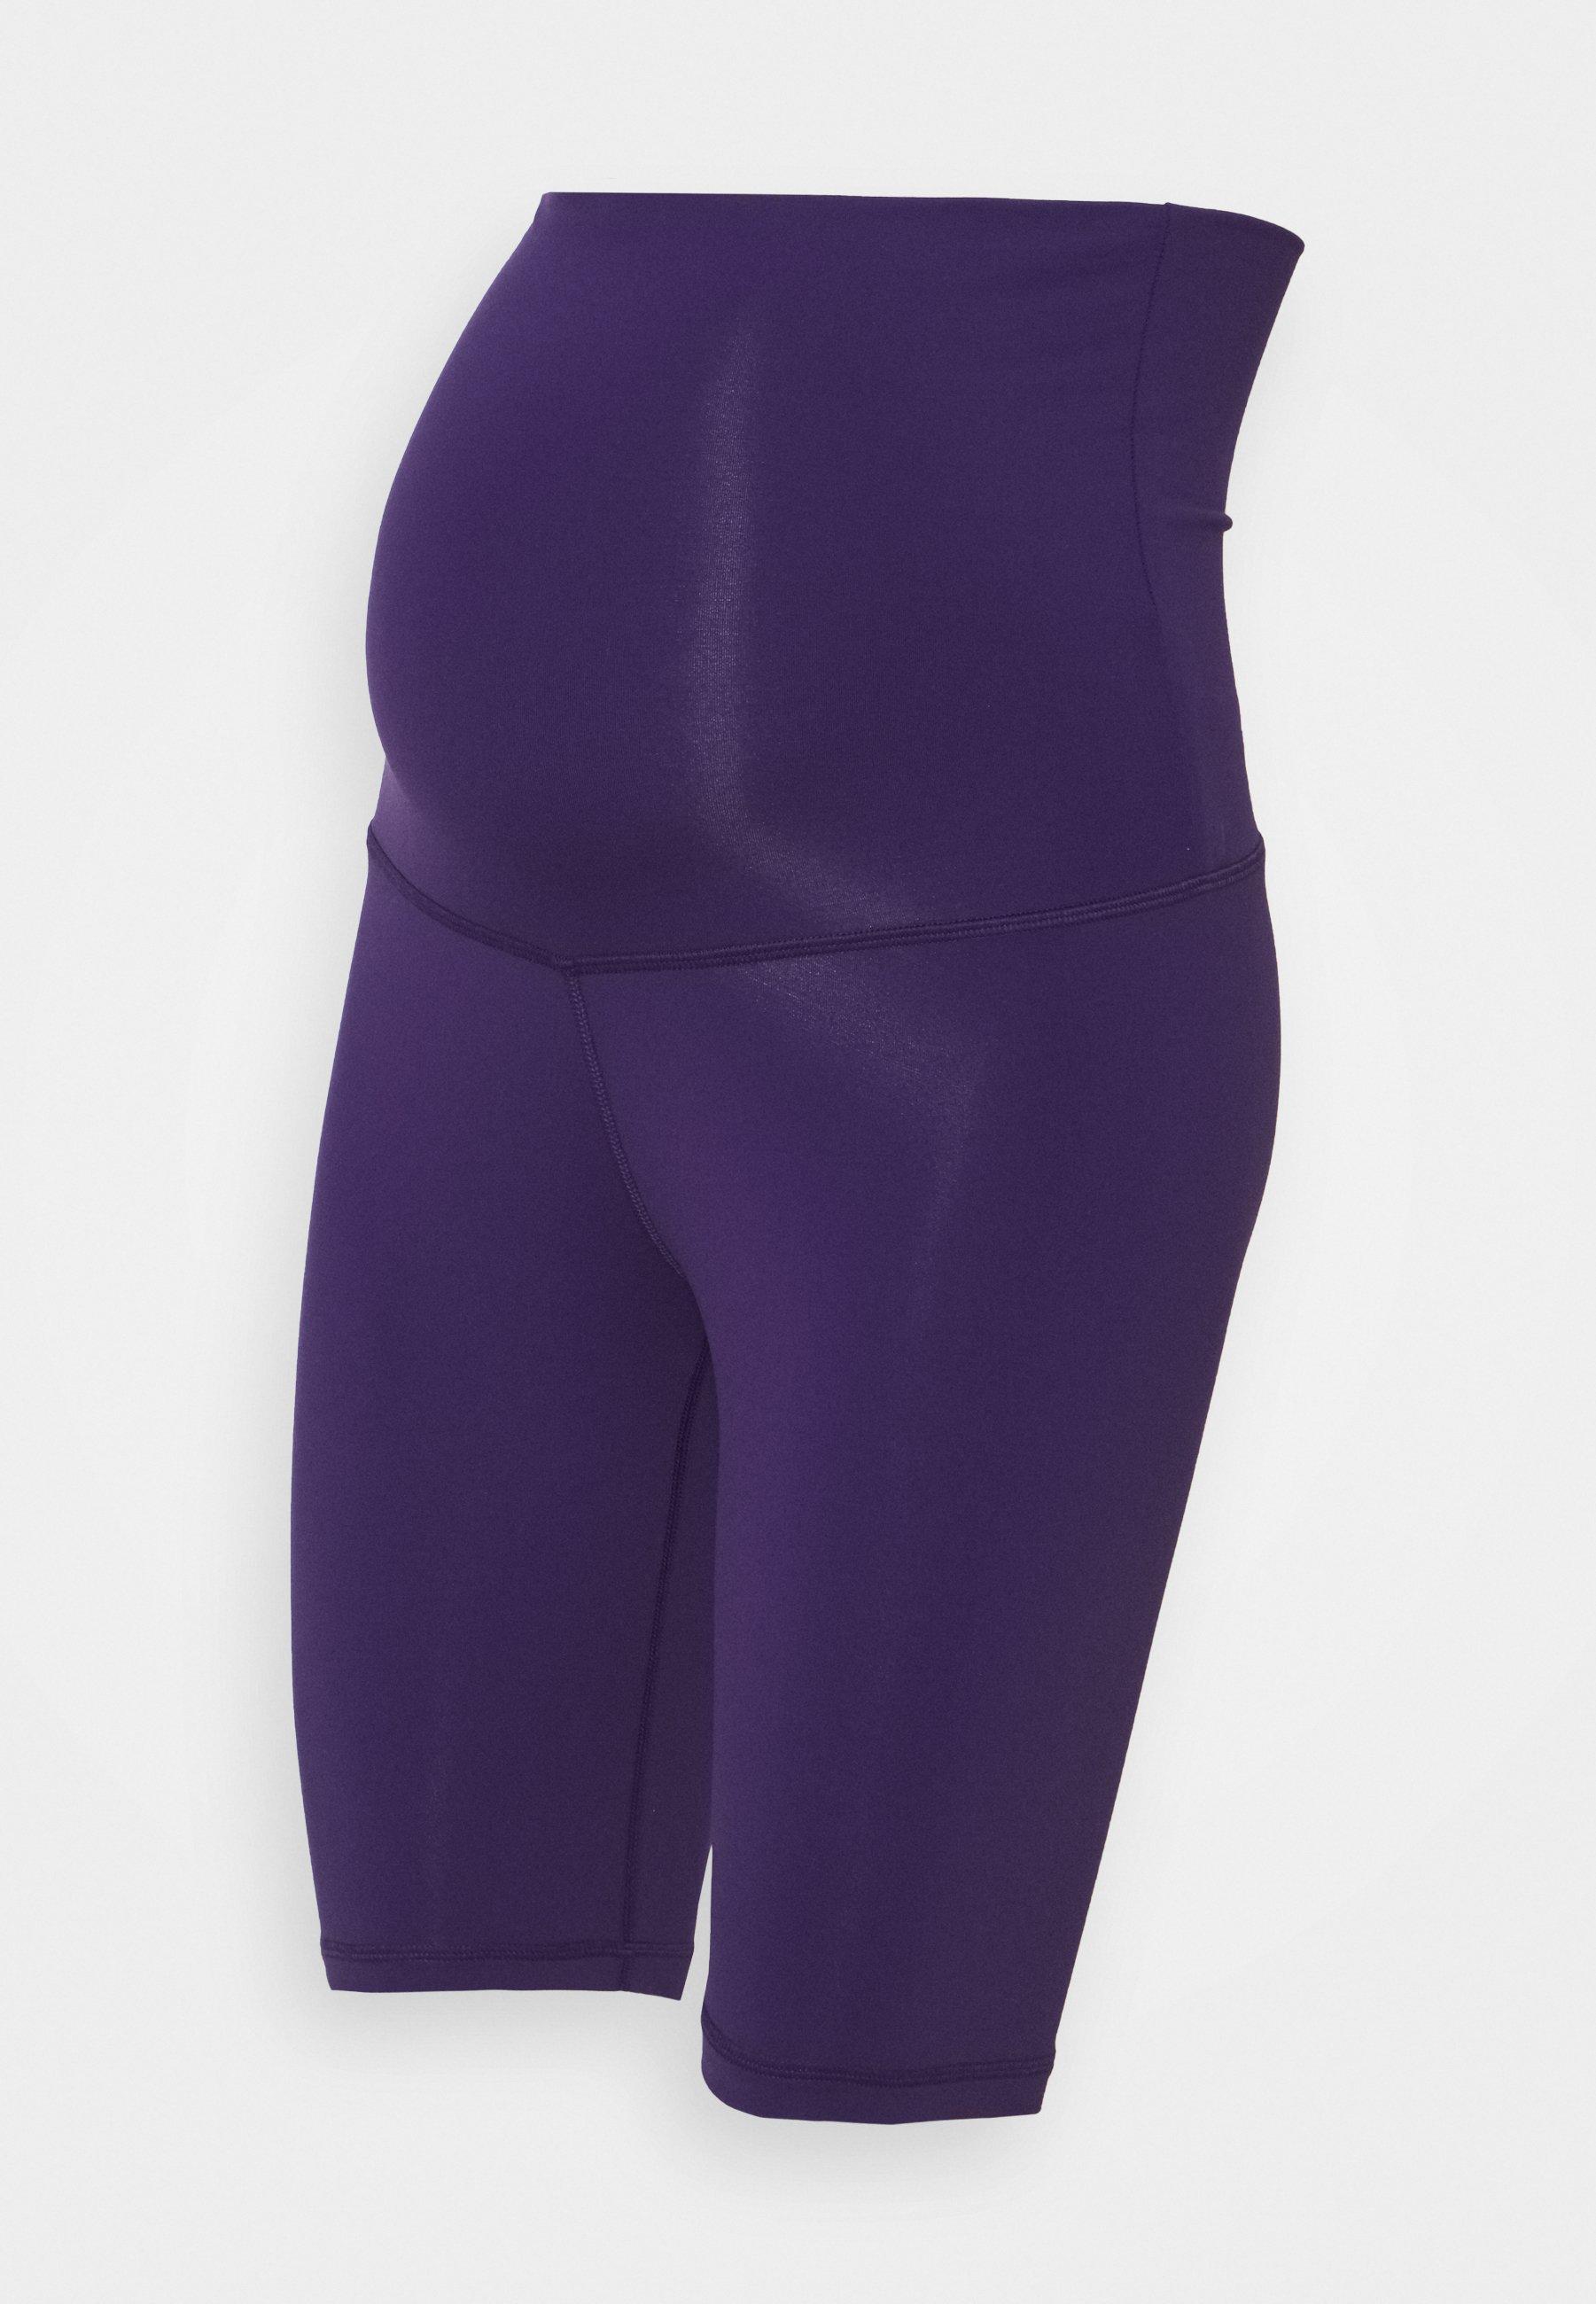 Femme LUX MATERNITY SHORT - Collants